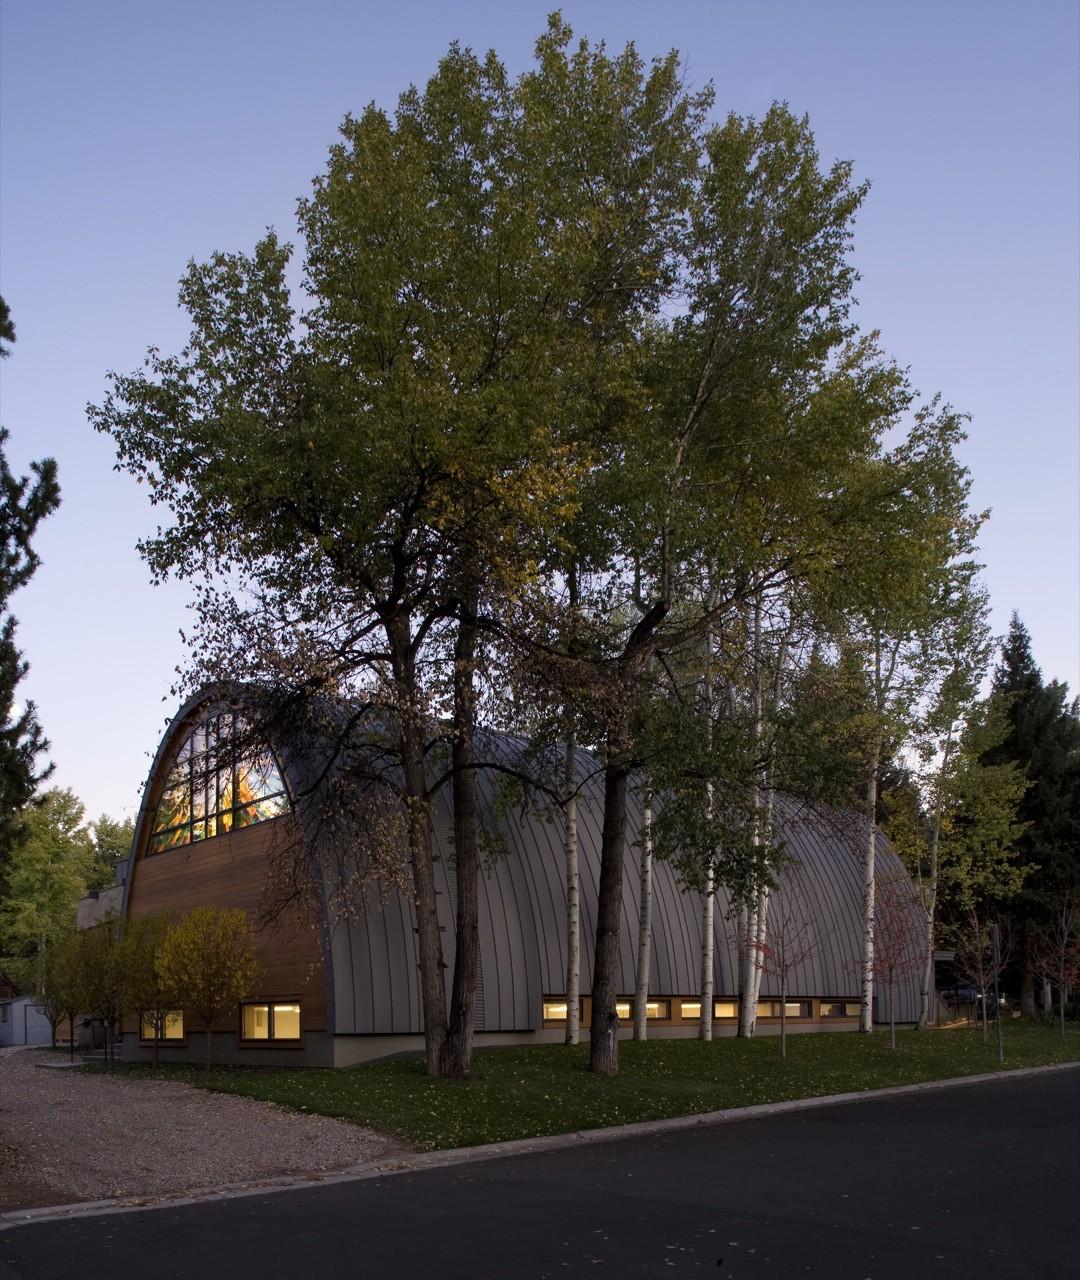 Christ Episcopal Church / Studio B Architects, © Raul J. Garcia